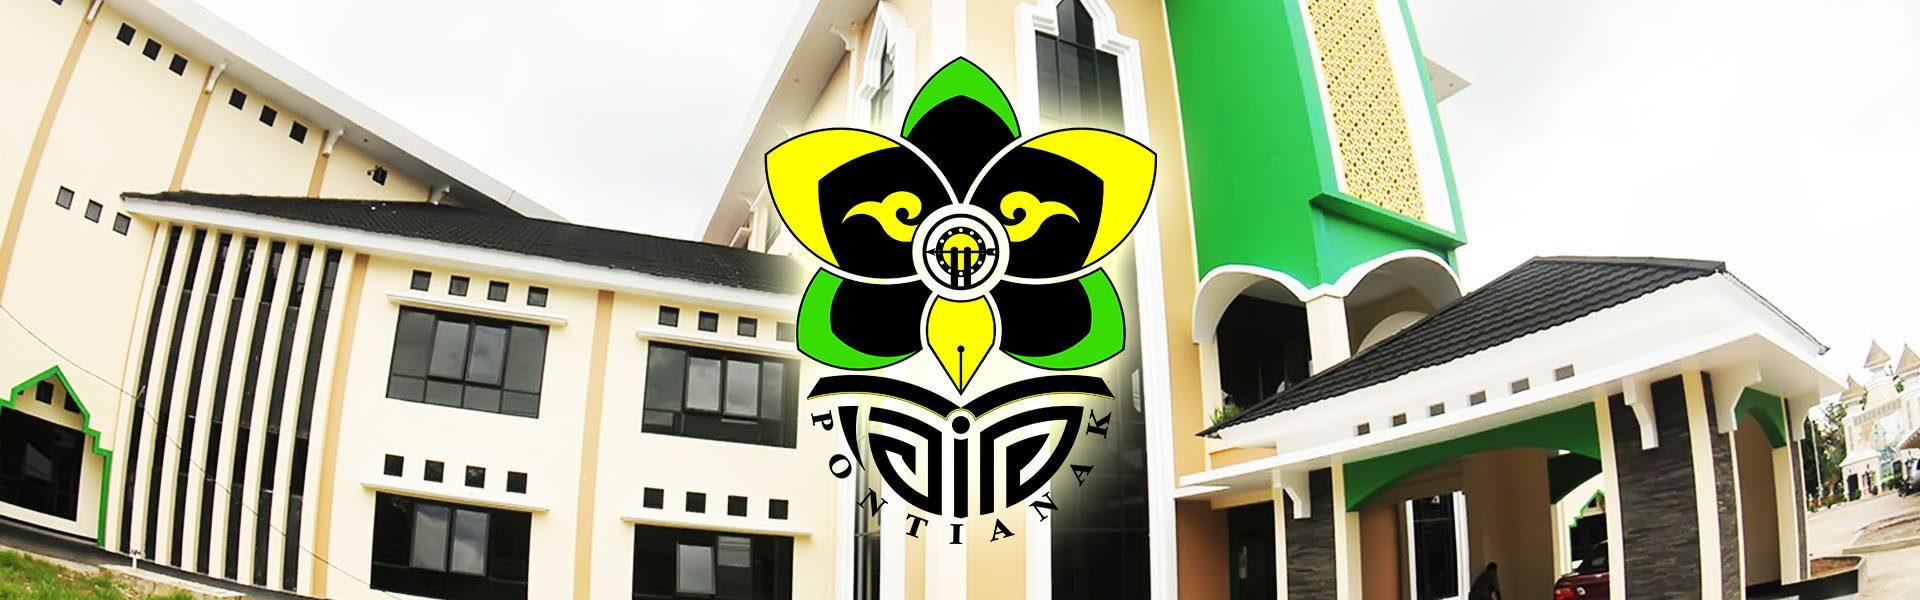 third image of Lambang Terbaru Iain Pontianak with Lambang Terbaru IAIN Pontianak | IAIN Pontianak